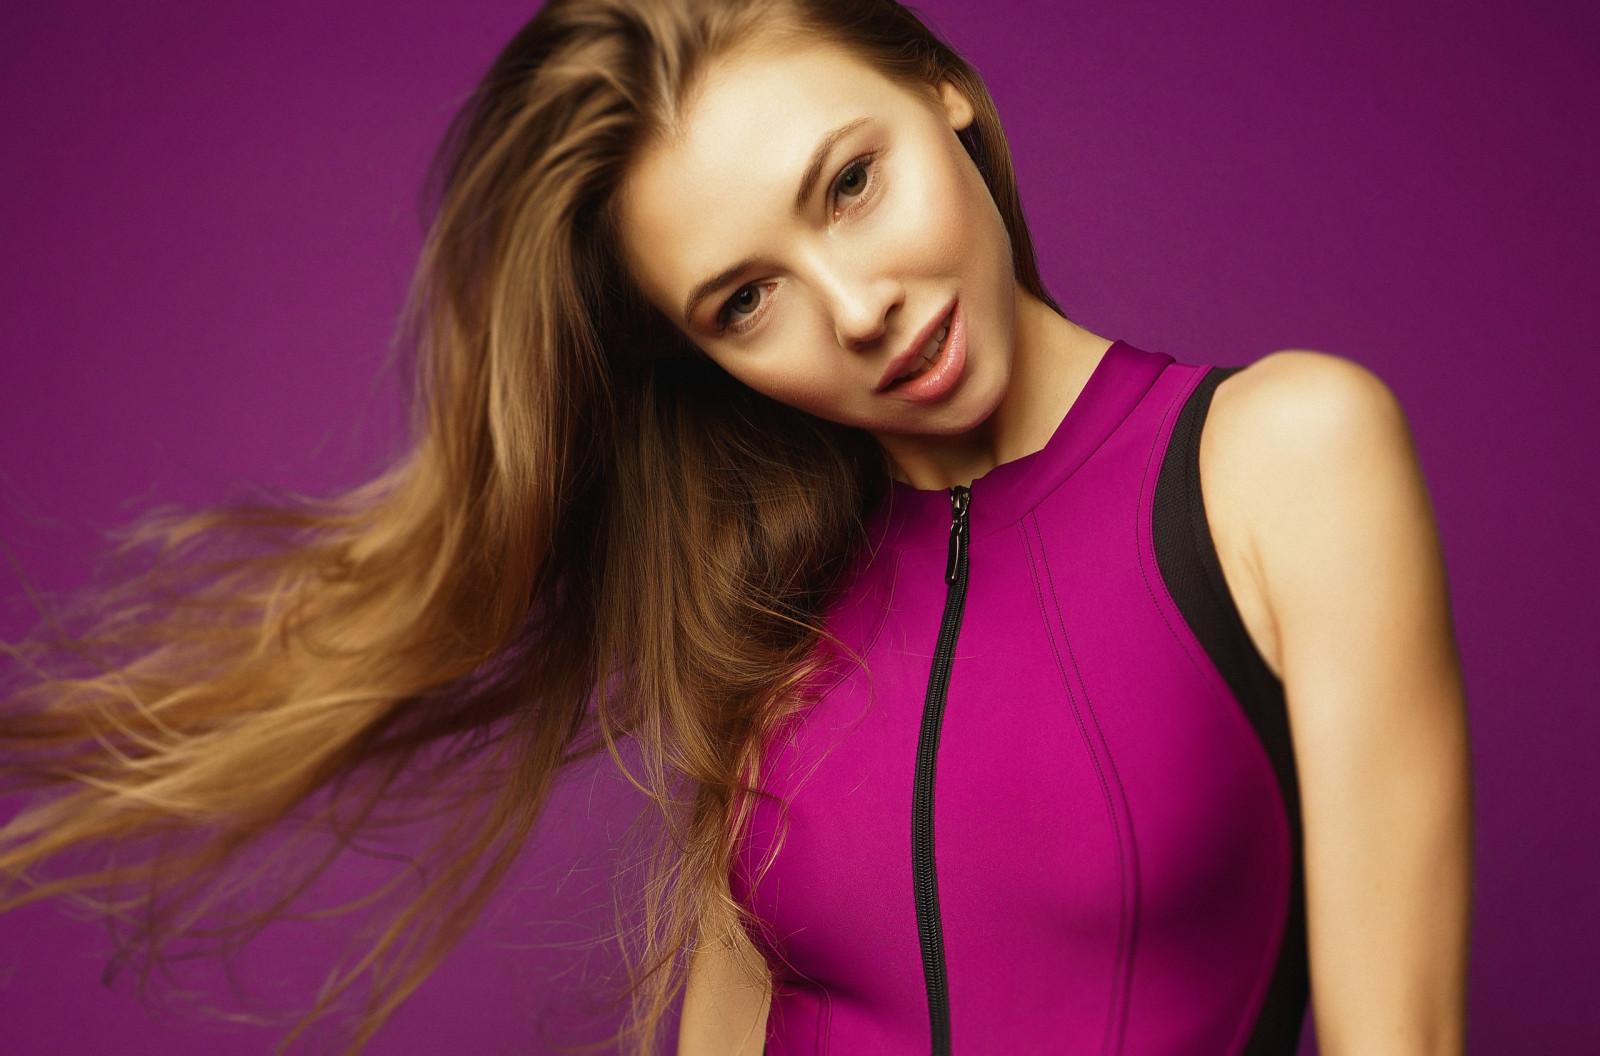 Katerina Bolinger Cute Bunny women model brunette indoors looking at viewer bokeh 1480763